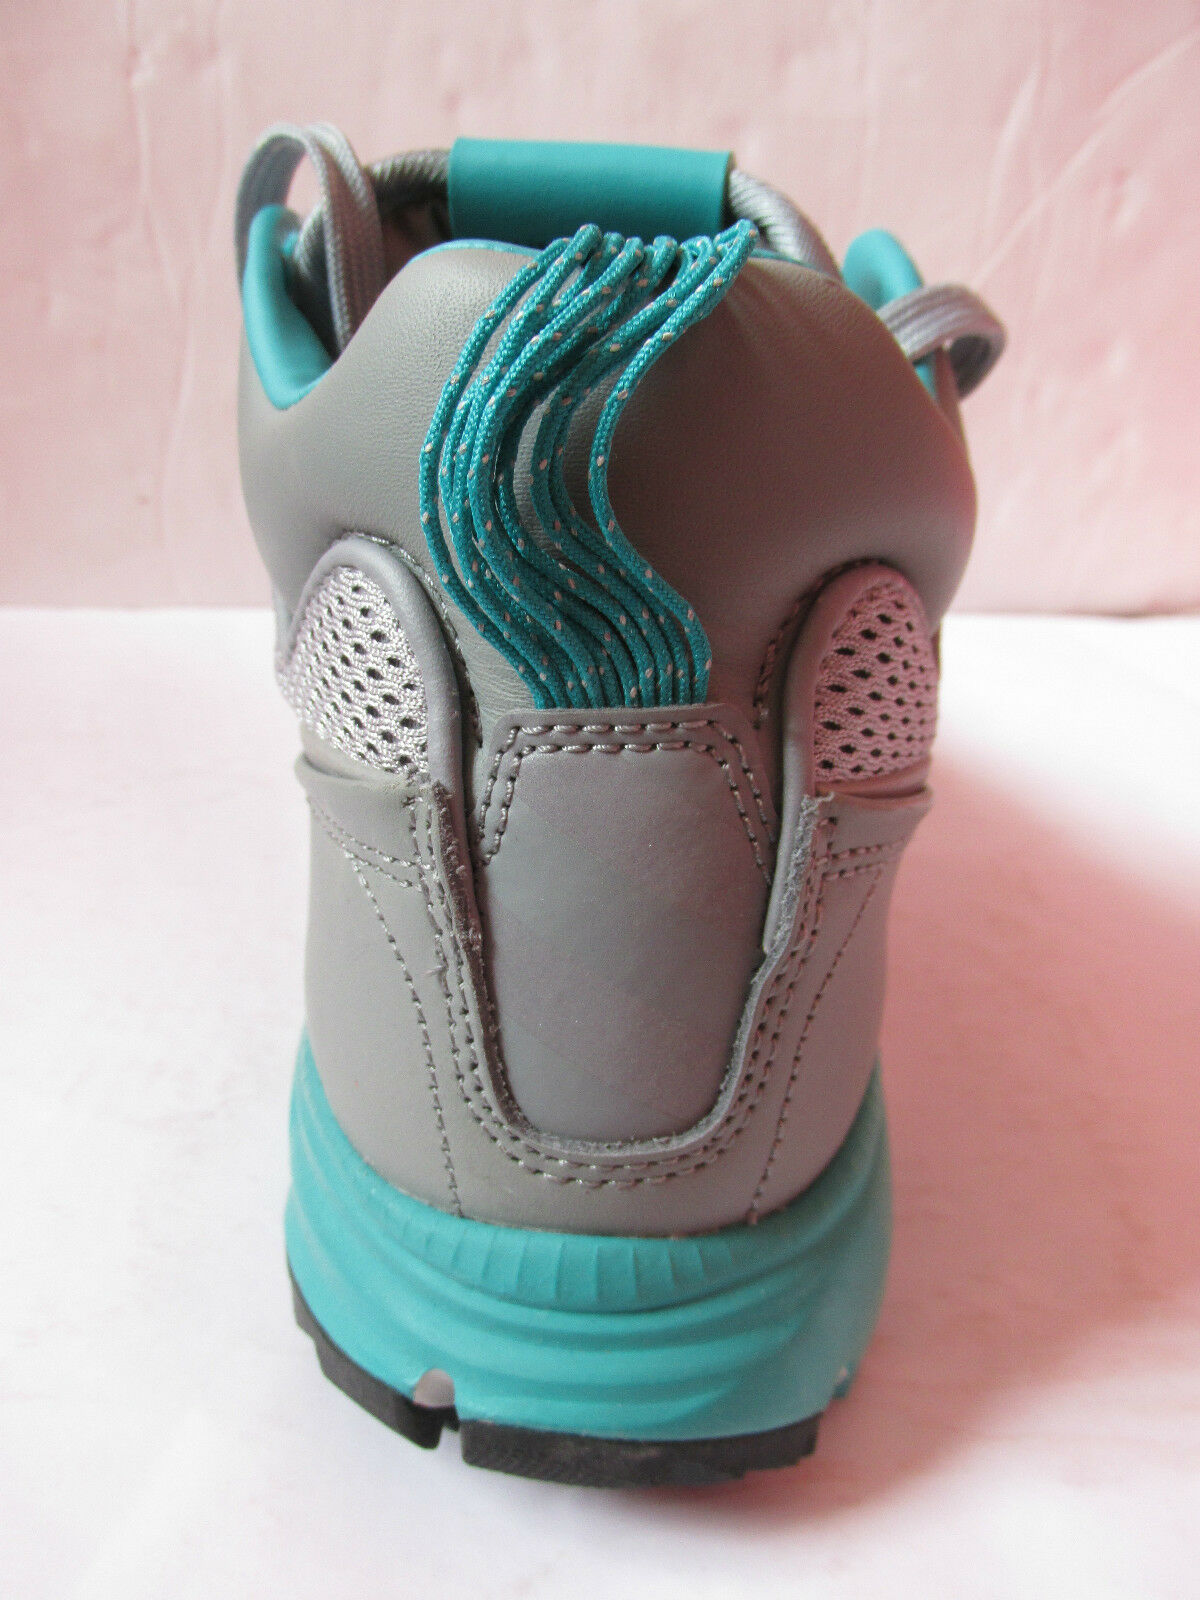 Nike Lunar LDV LDV LDV Turnstiefel Sp Herren Hohe Stiefel 646103 Sneakers Sportschuhe af147f